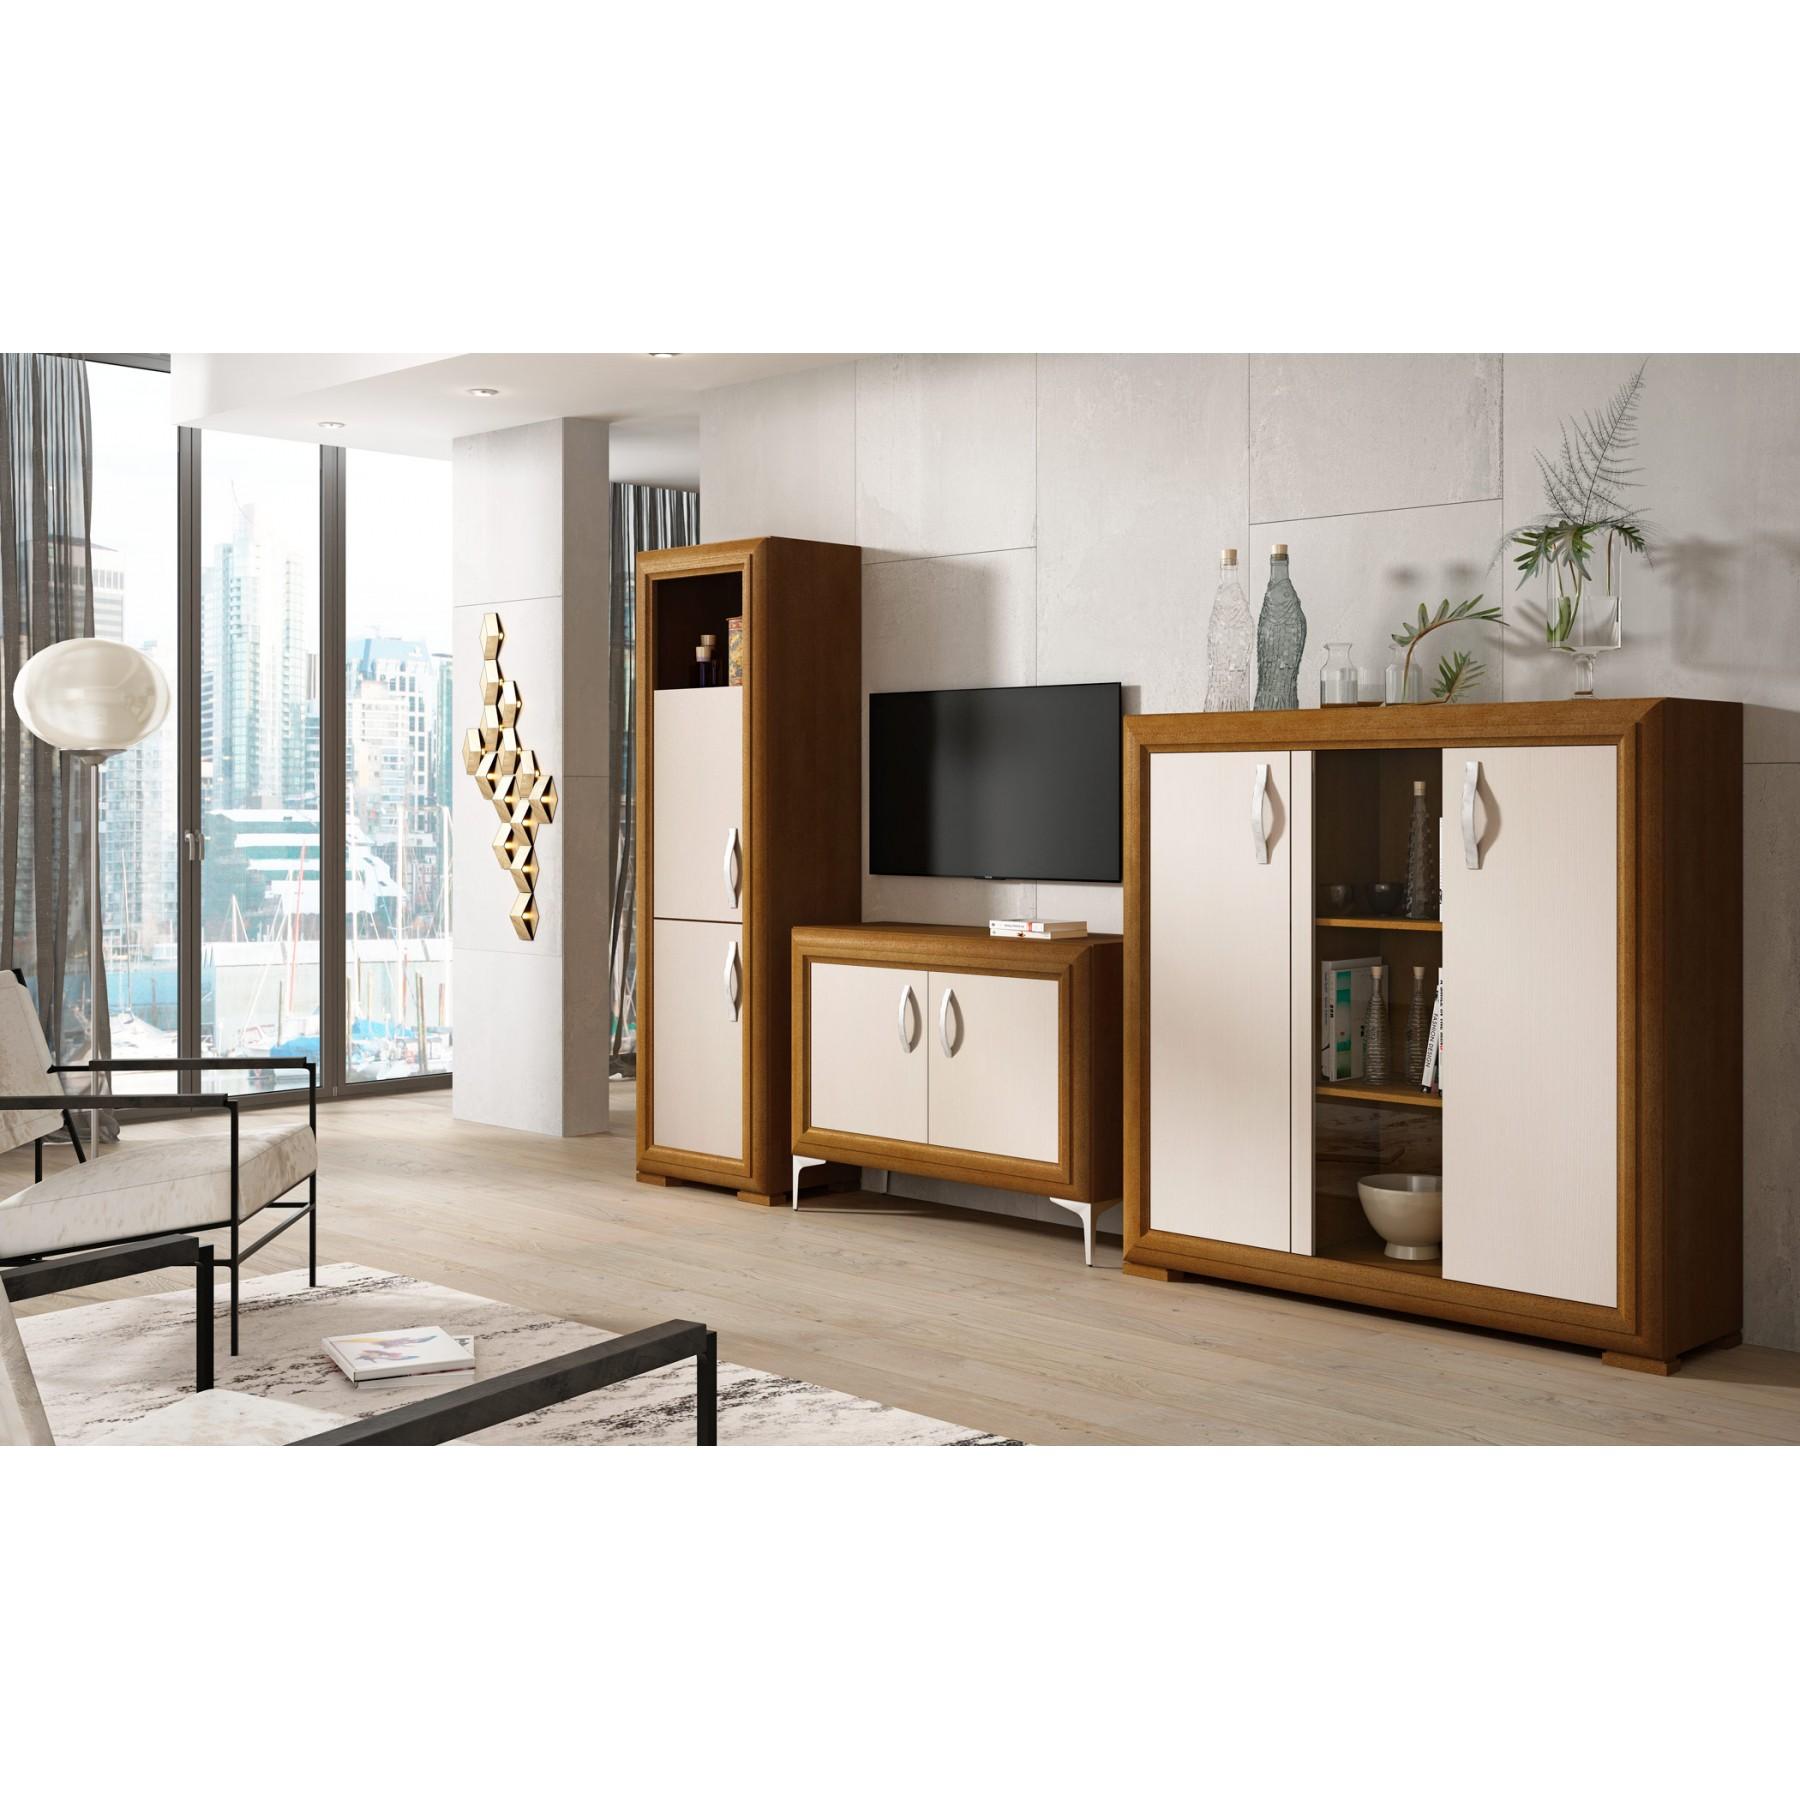 Conjunto muebles de sal n modelo baetica for Conjunto muebles salon